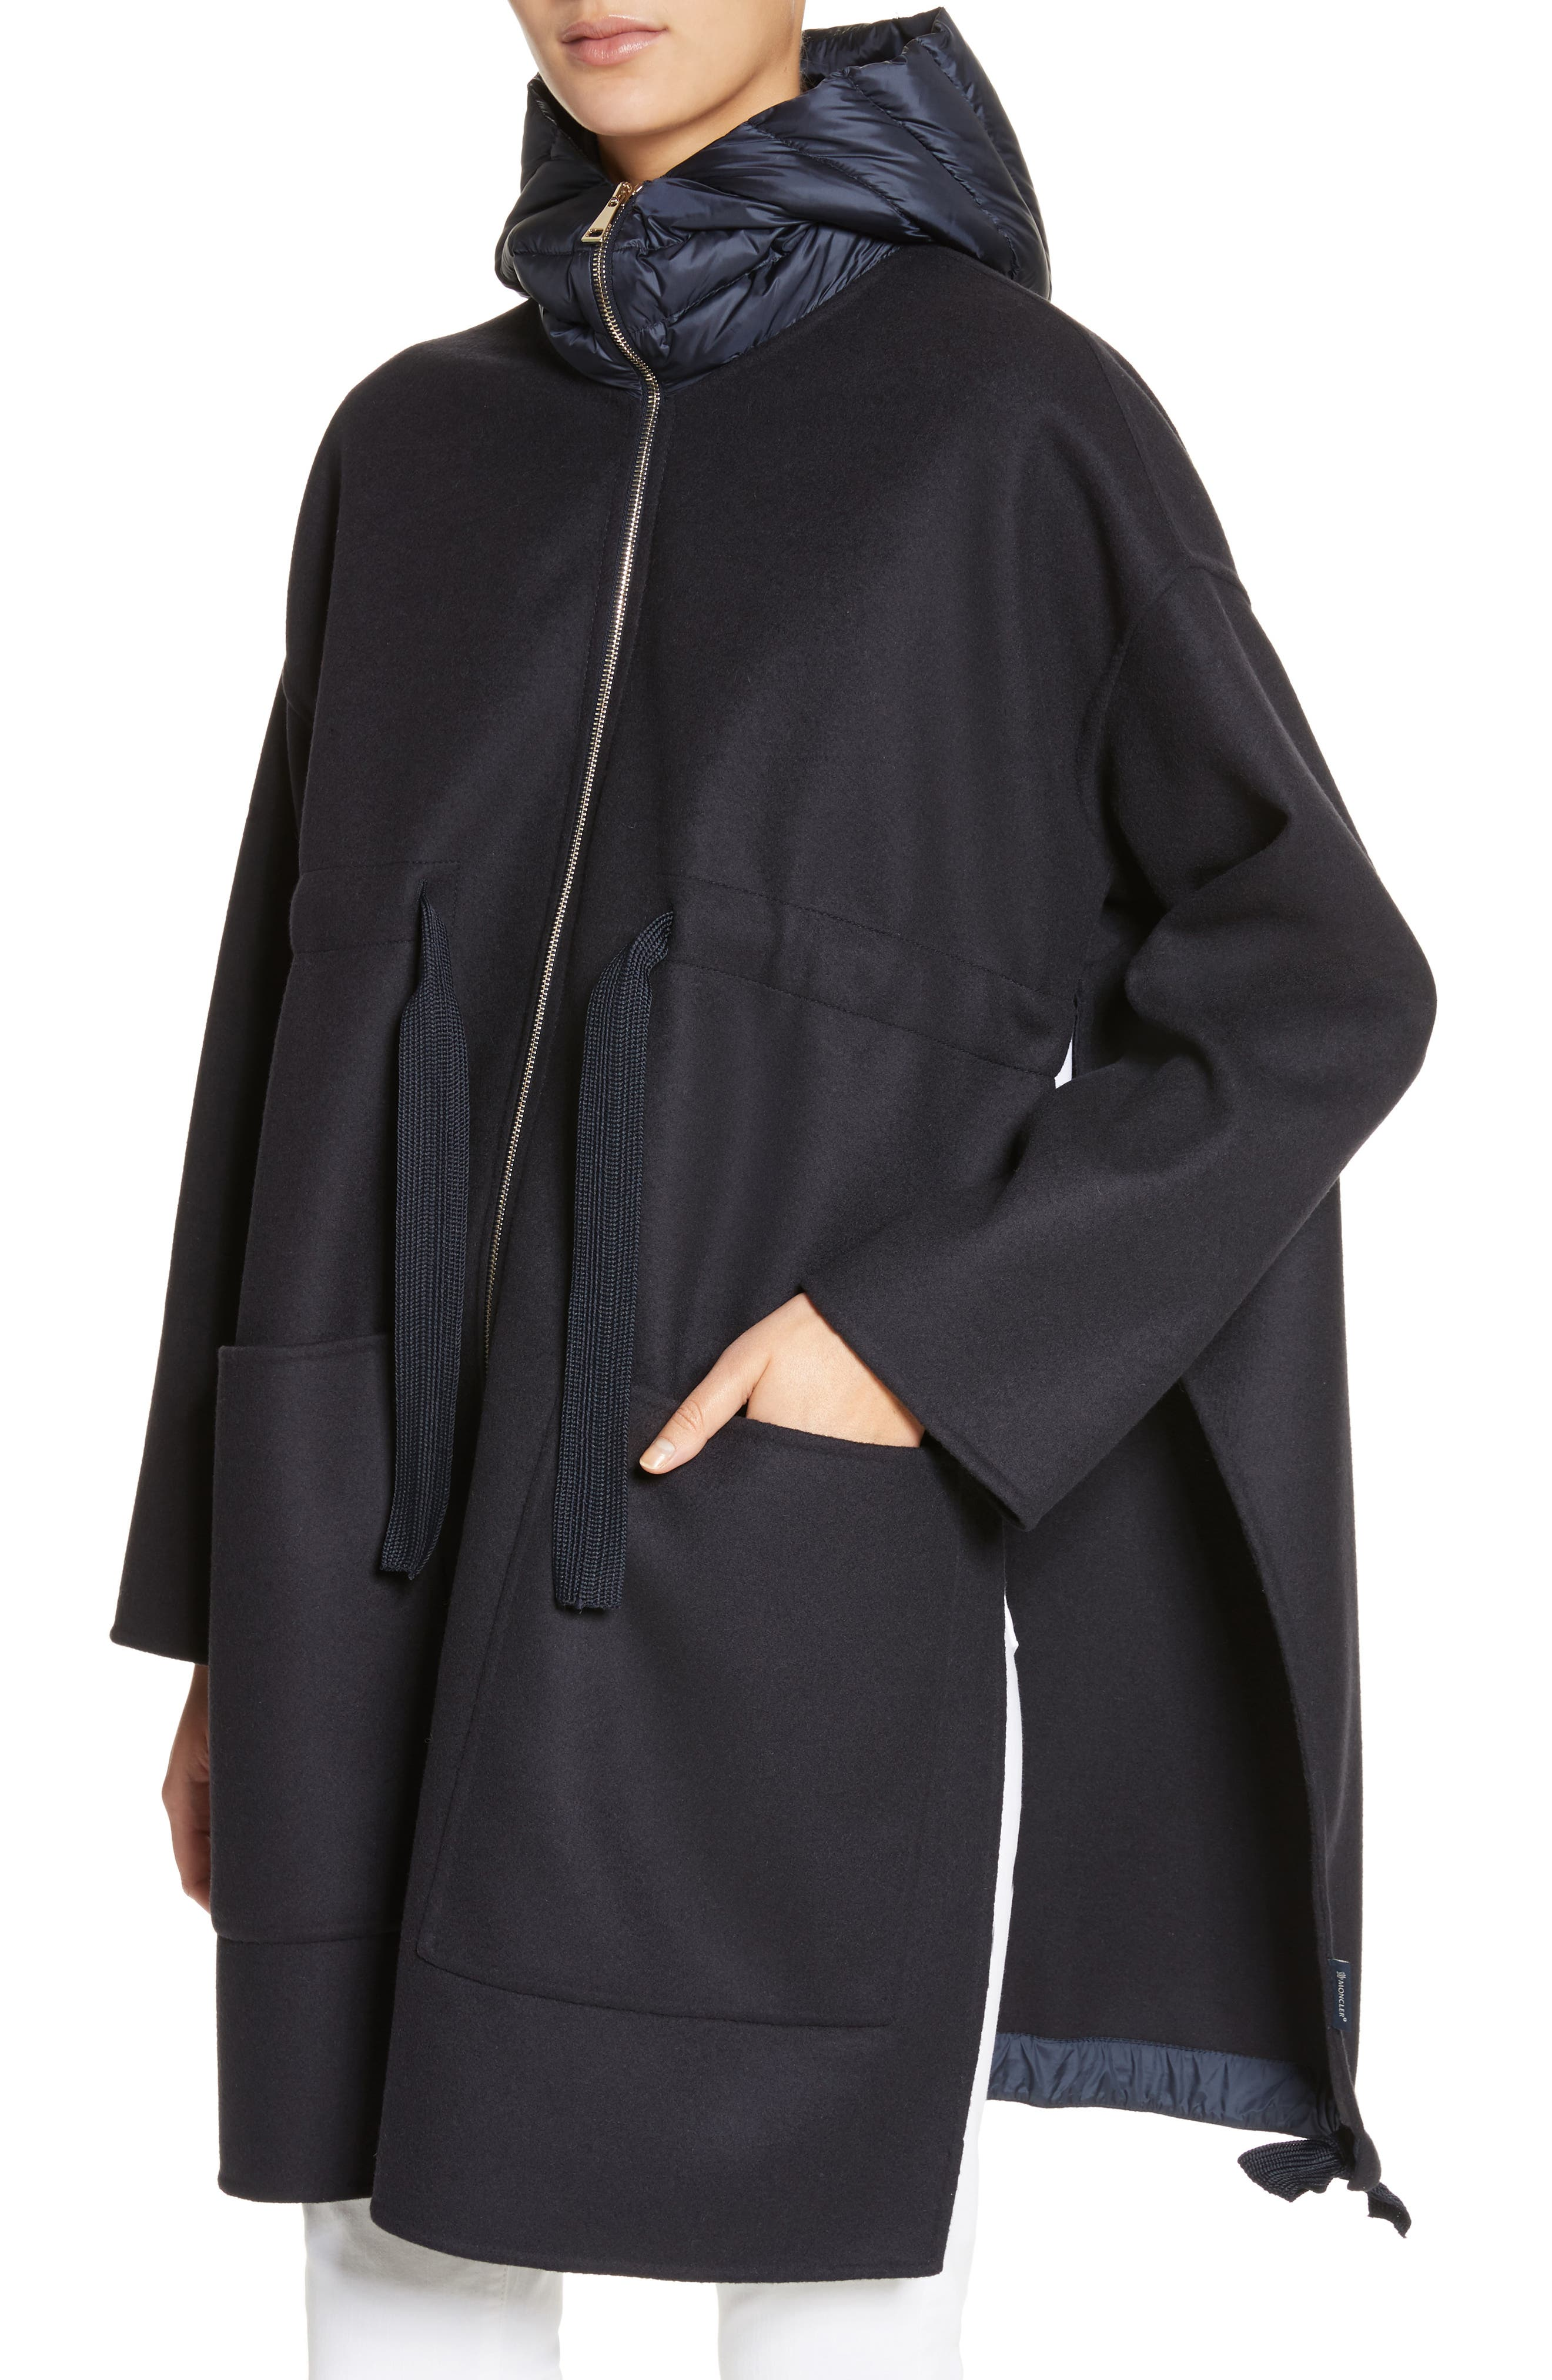 Grenat Wool & Cashmere Hooded Jacket,                             Alternate thumbnail 4, color,                             Navy